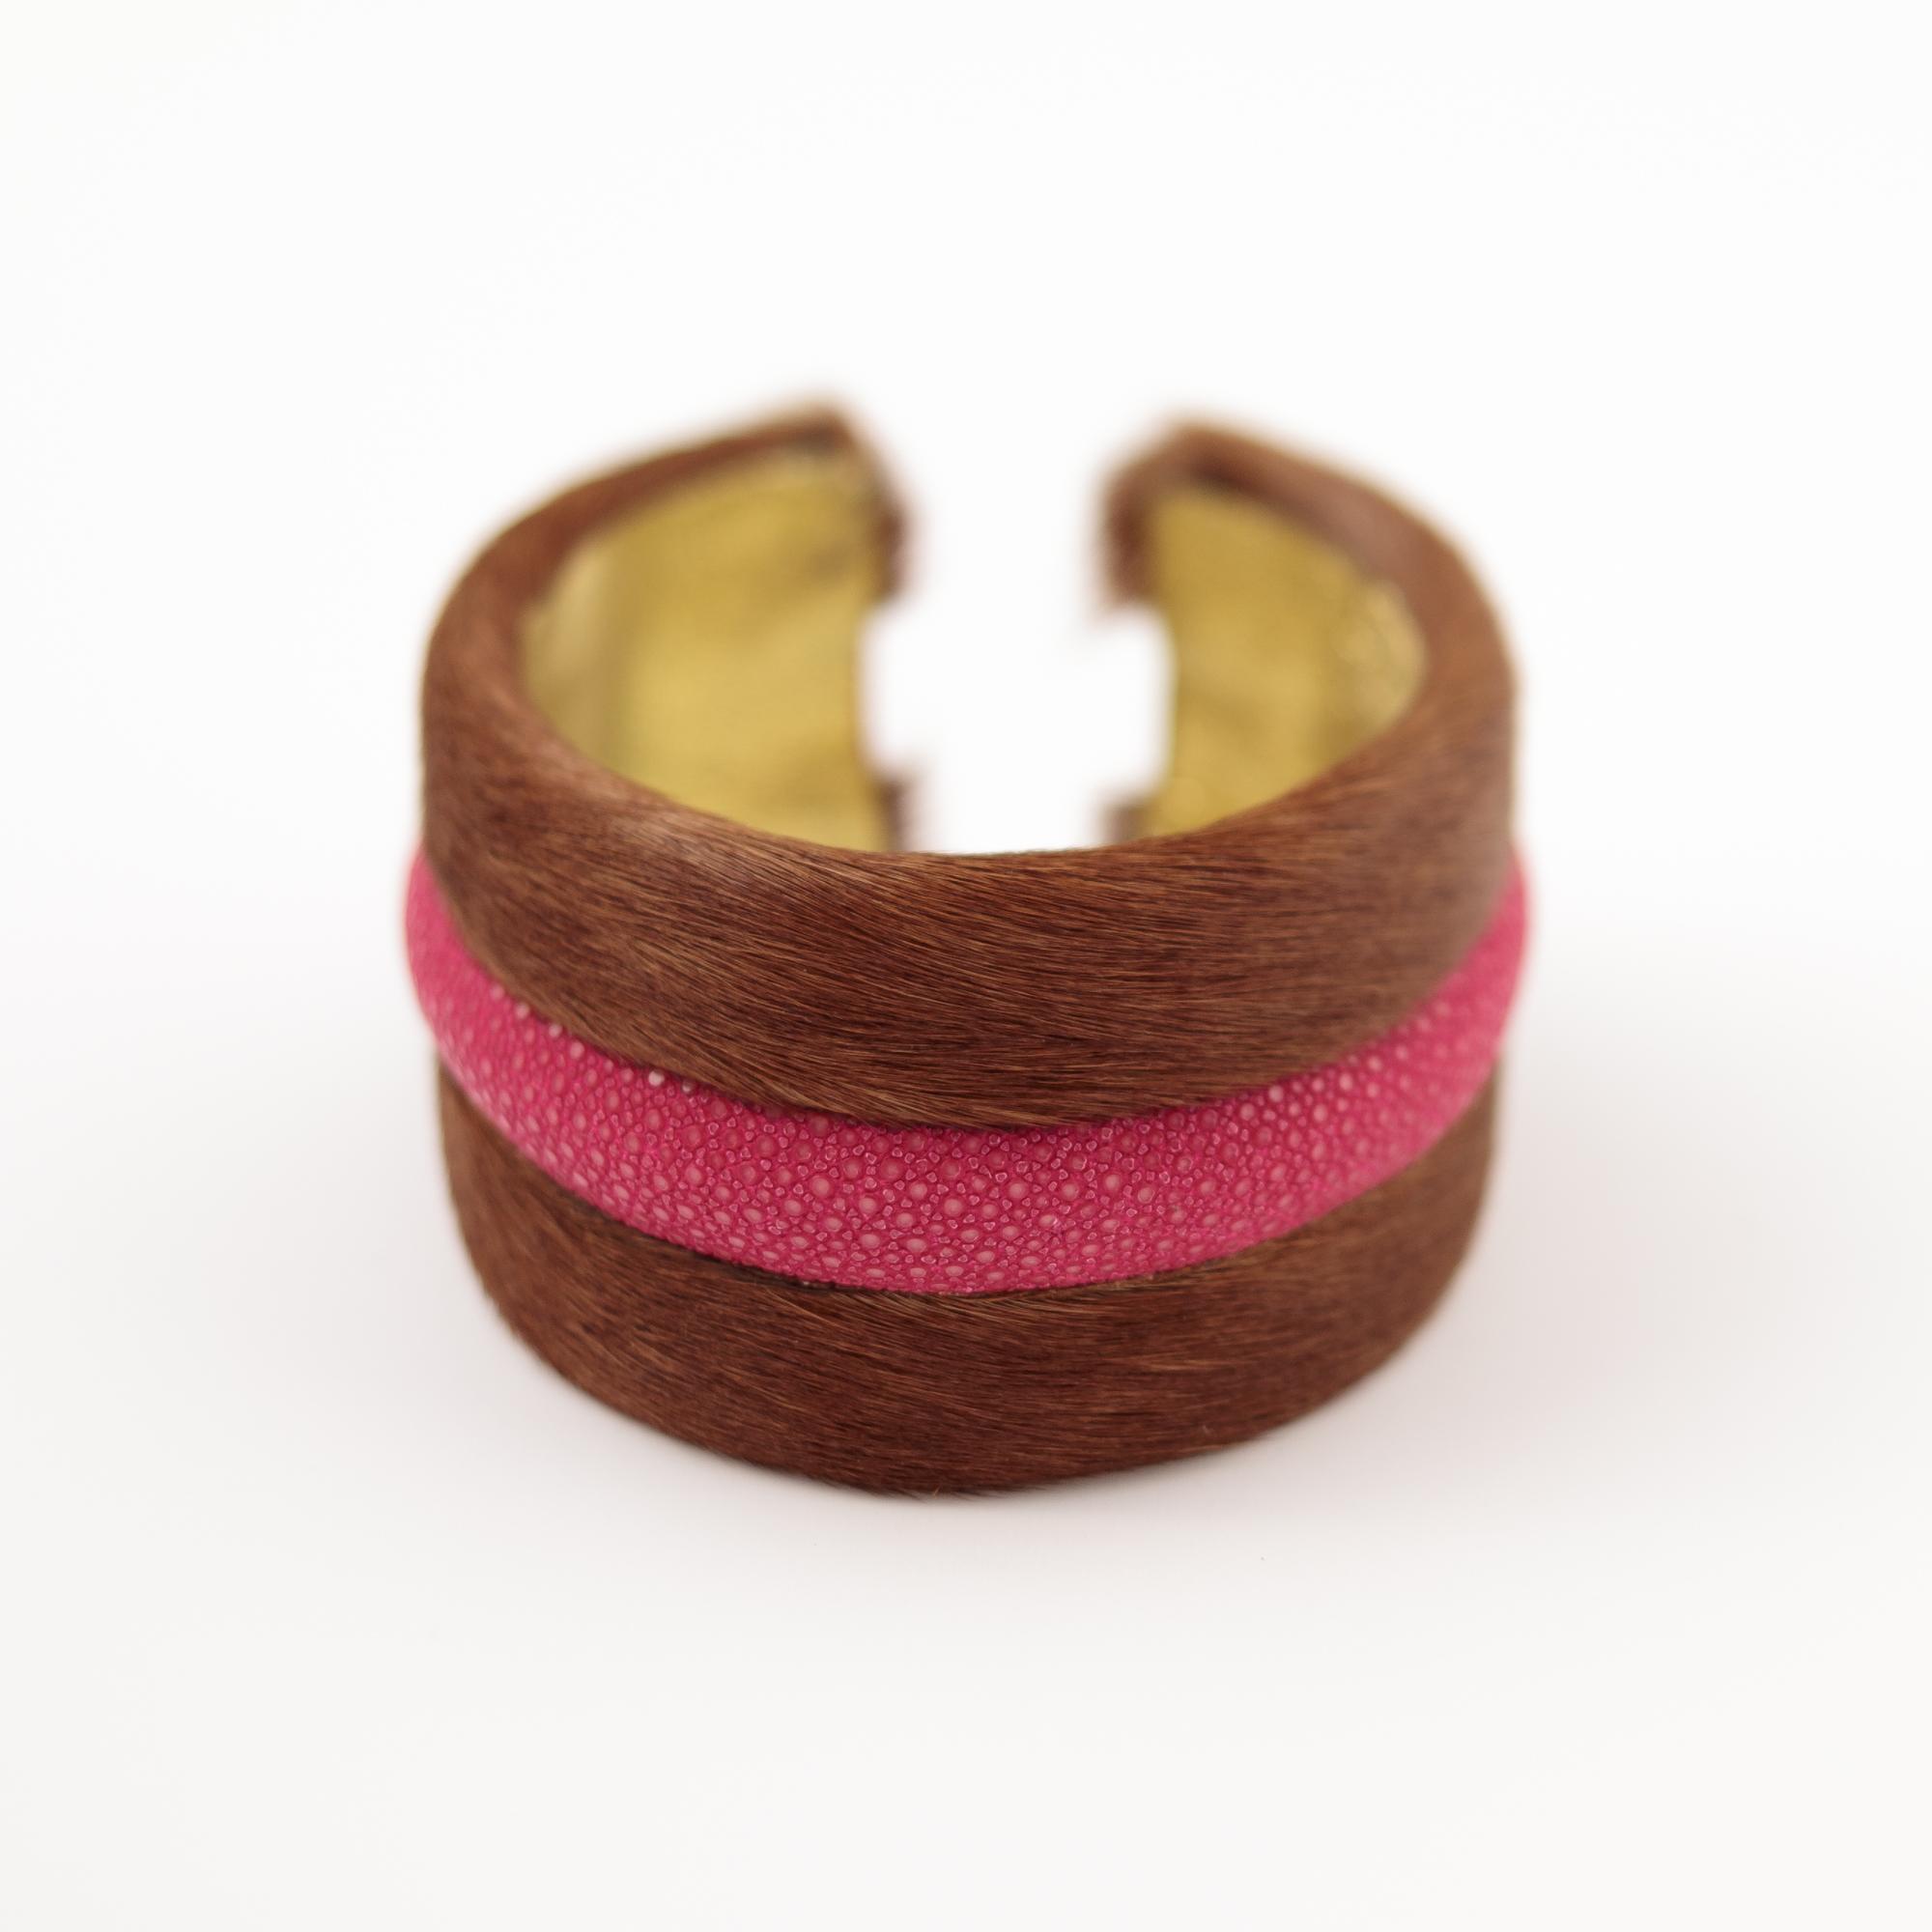 tresor-by-flore-galuchat-bracelet-poilu-marron-fushia